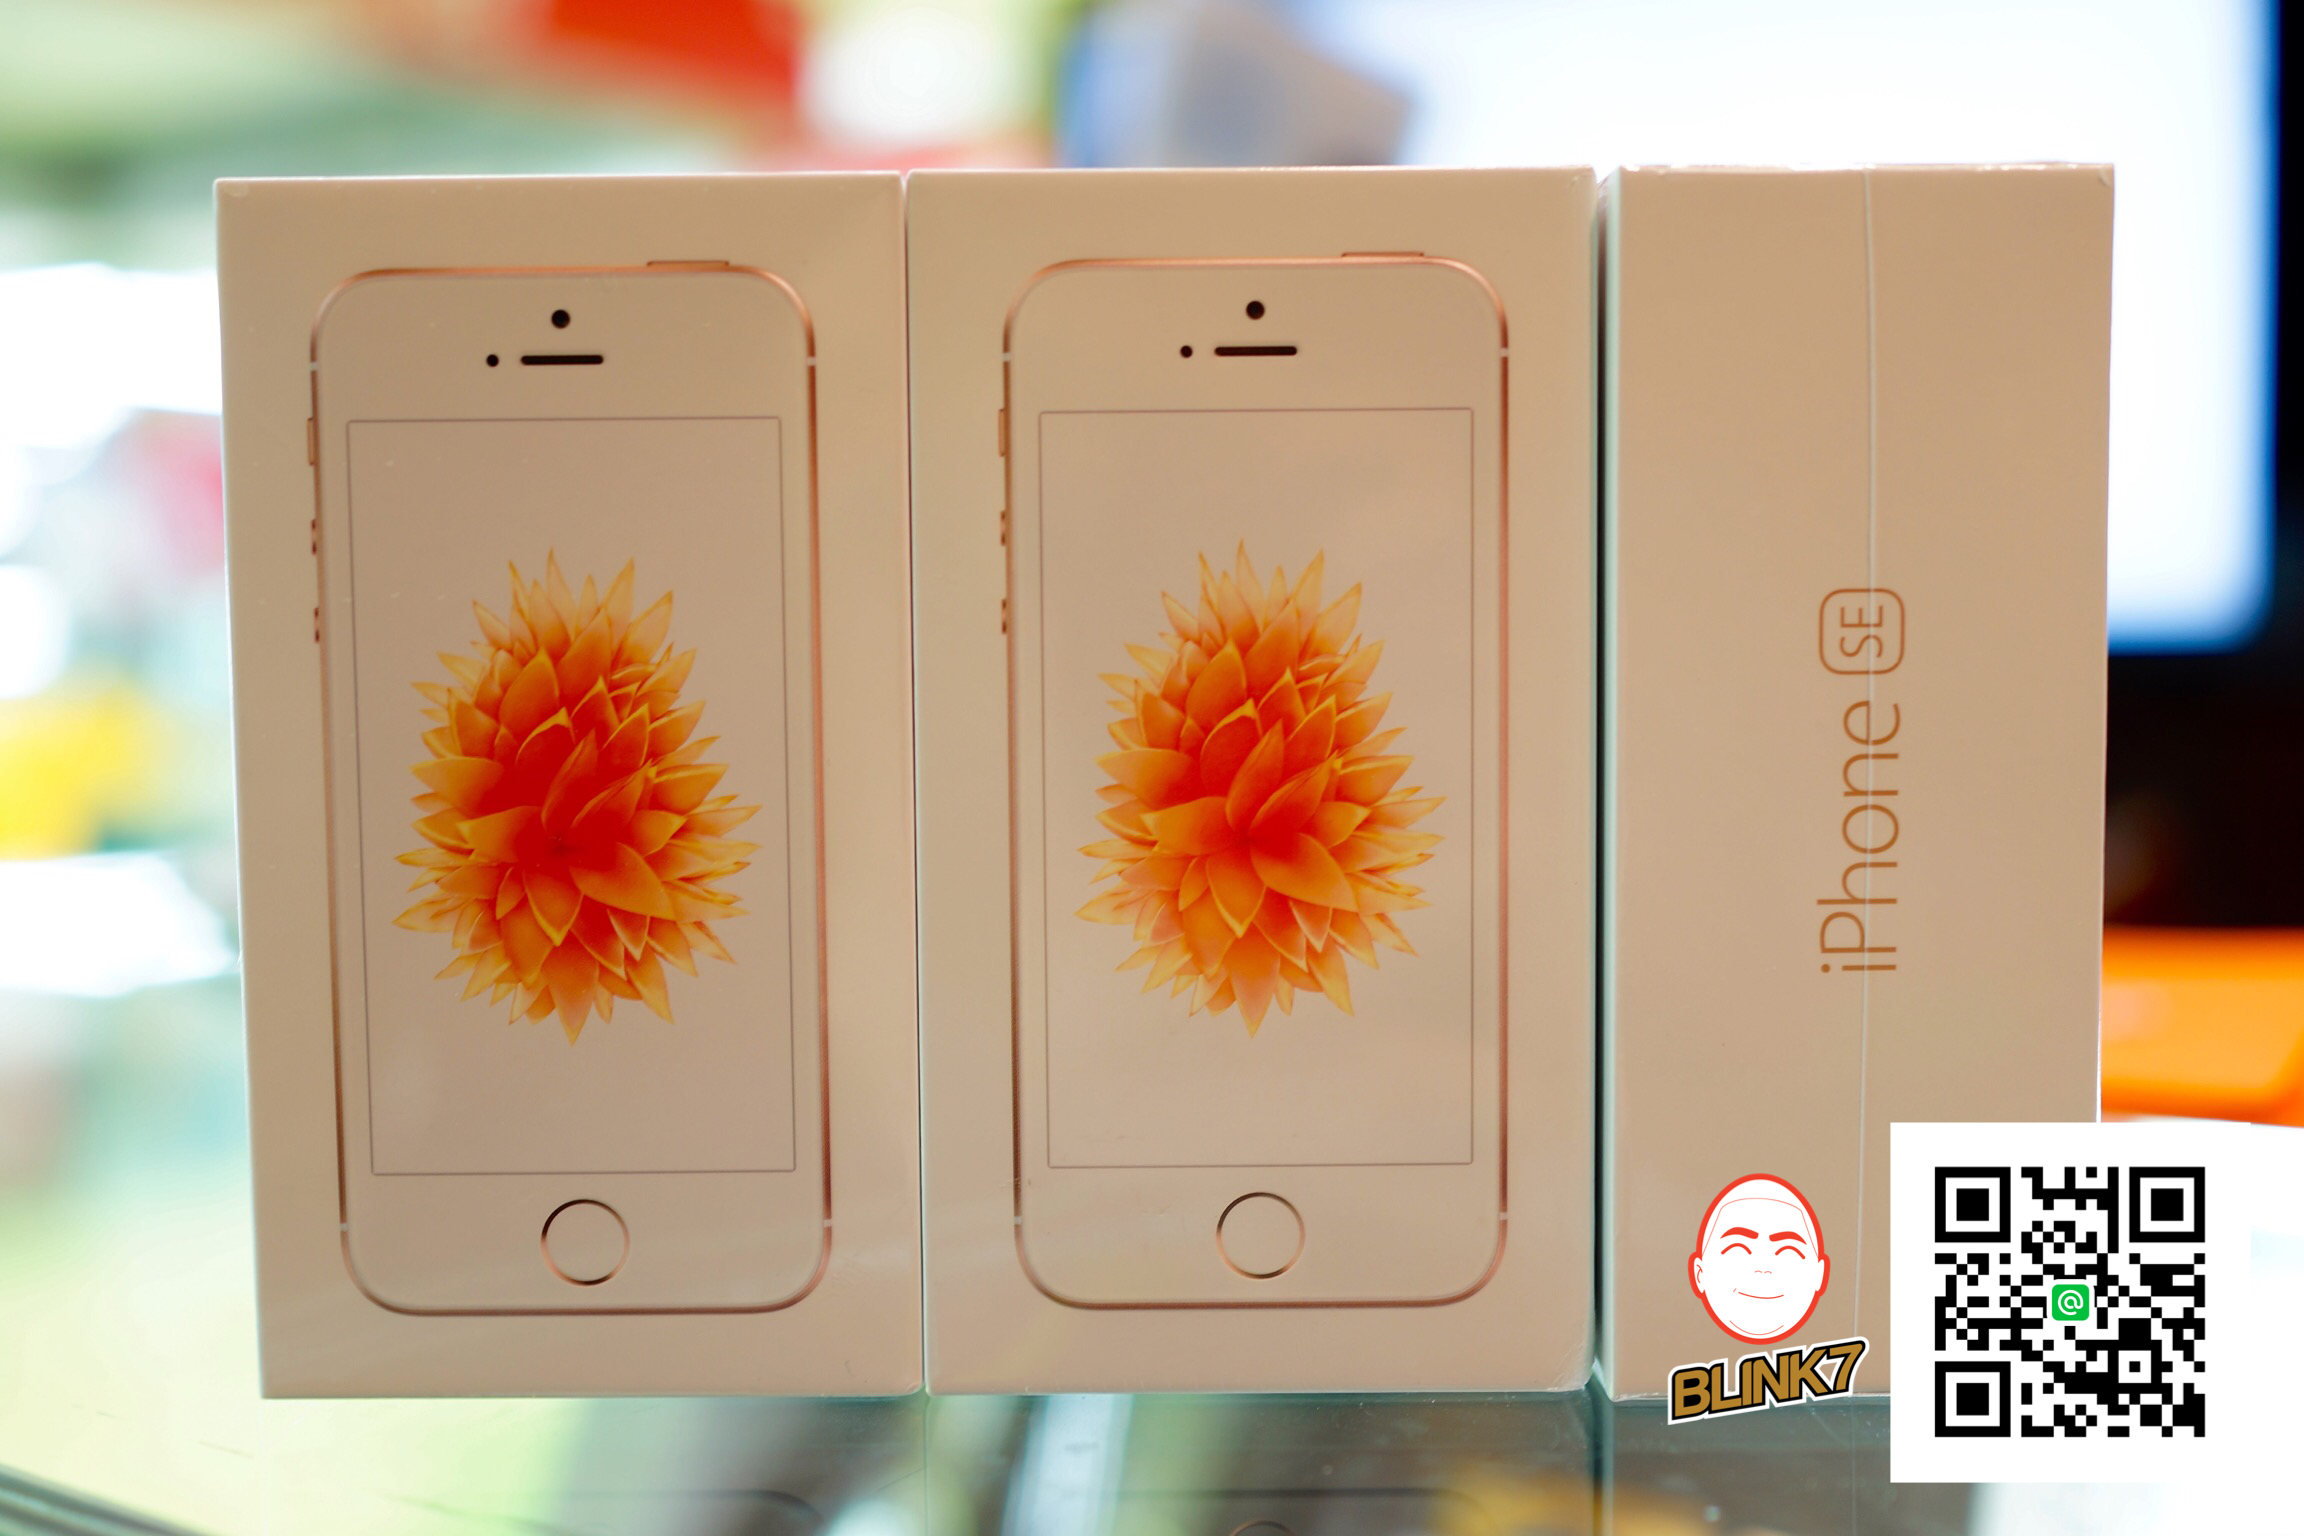 Unboxing : iPhone SE สี Rose Gold เครื่องโครตเร็ว กล้องชัดมากก